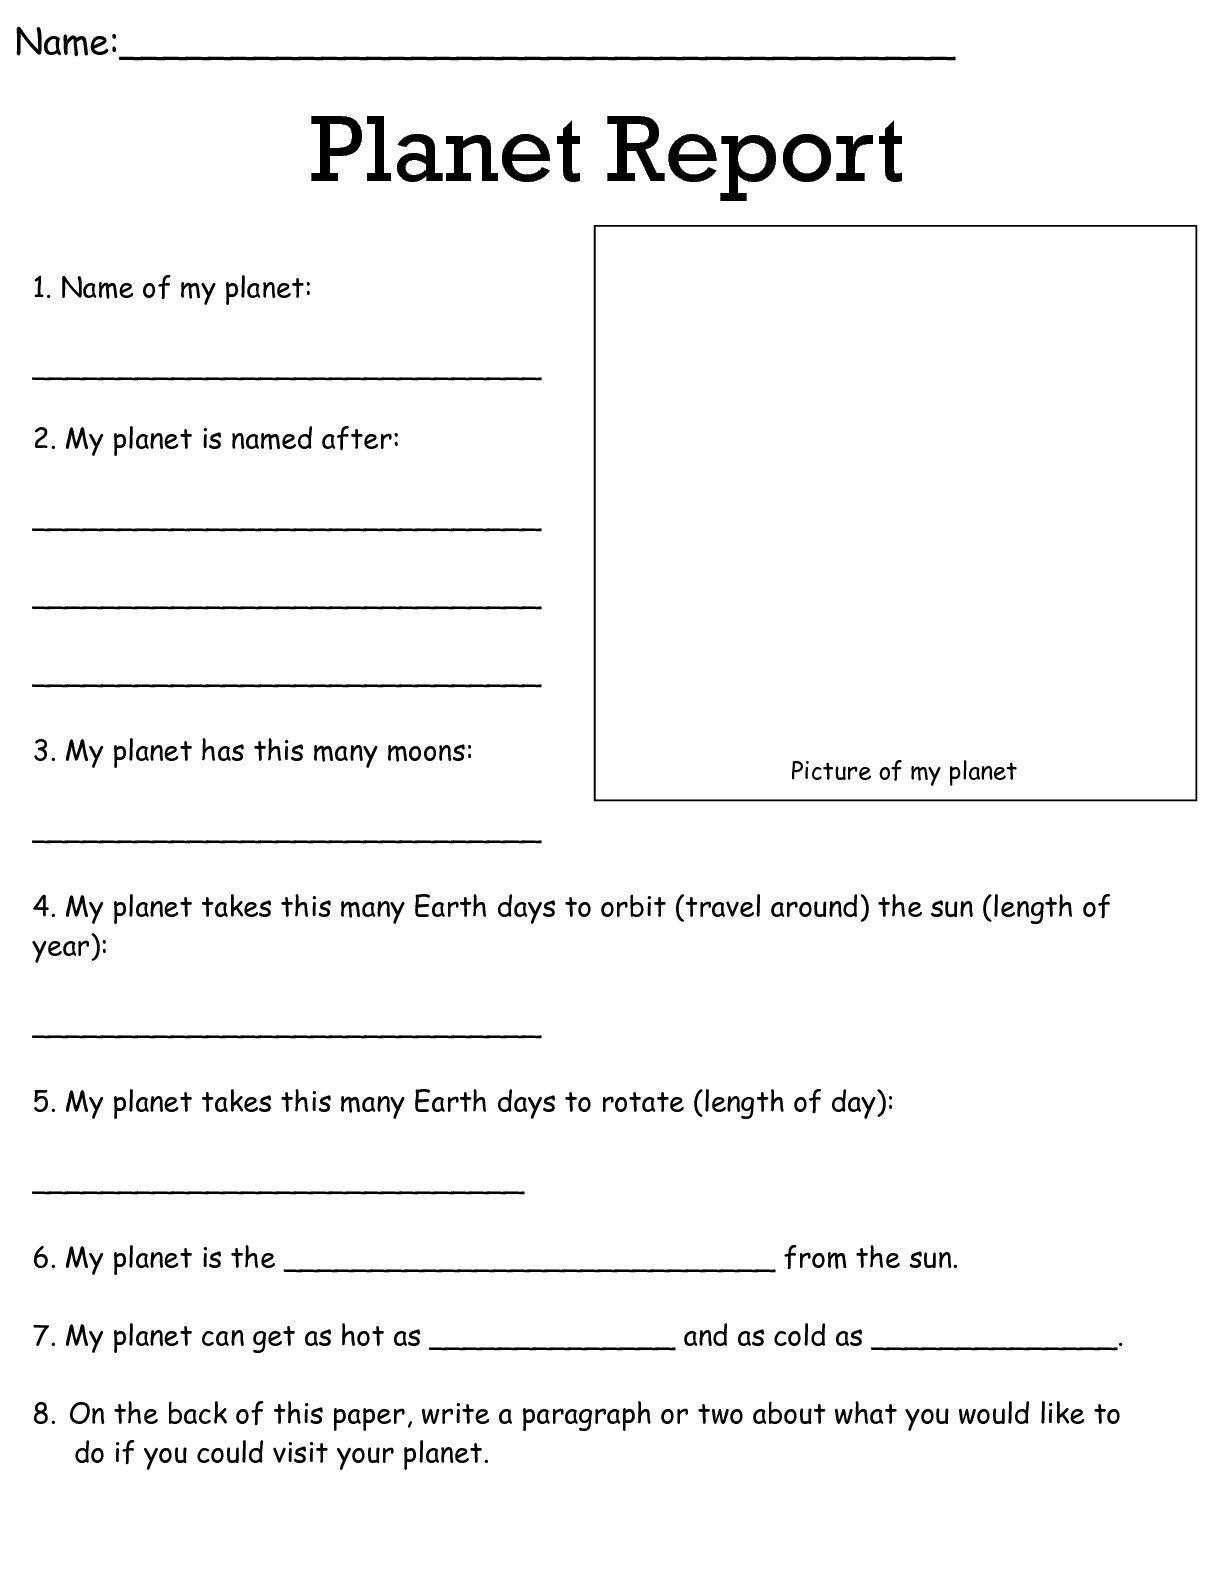 Job Worksheets 5Th &6Th | Science Worksheets Science Worksheets | Grade 8 Science Worksheets Printable